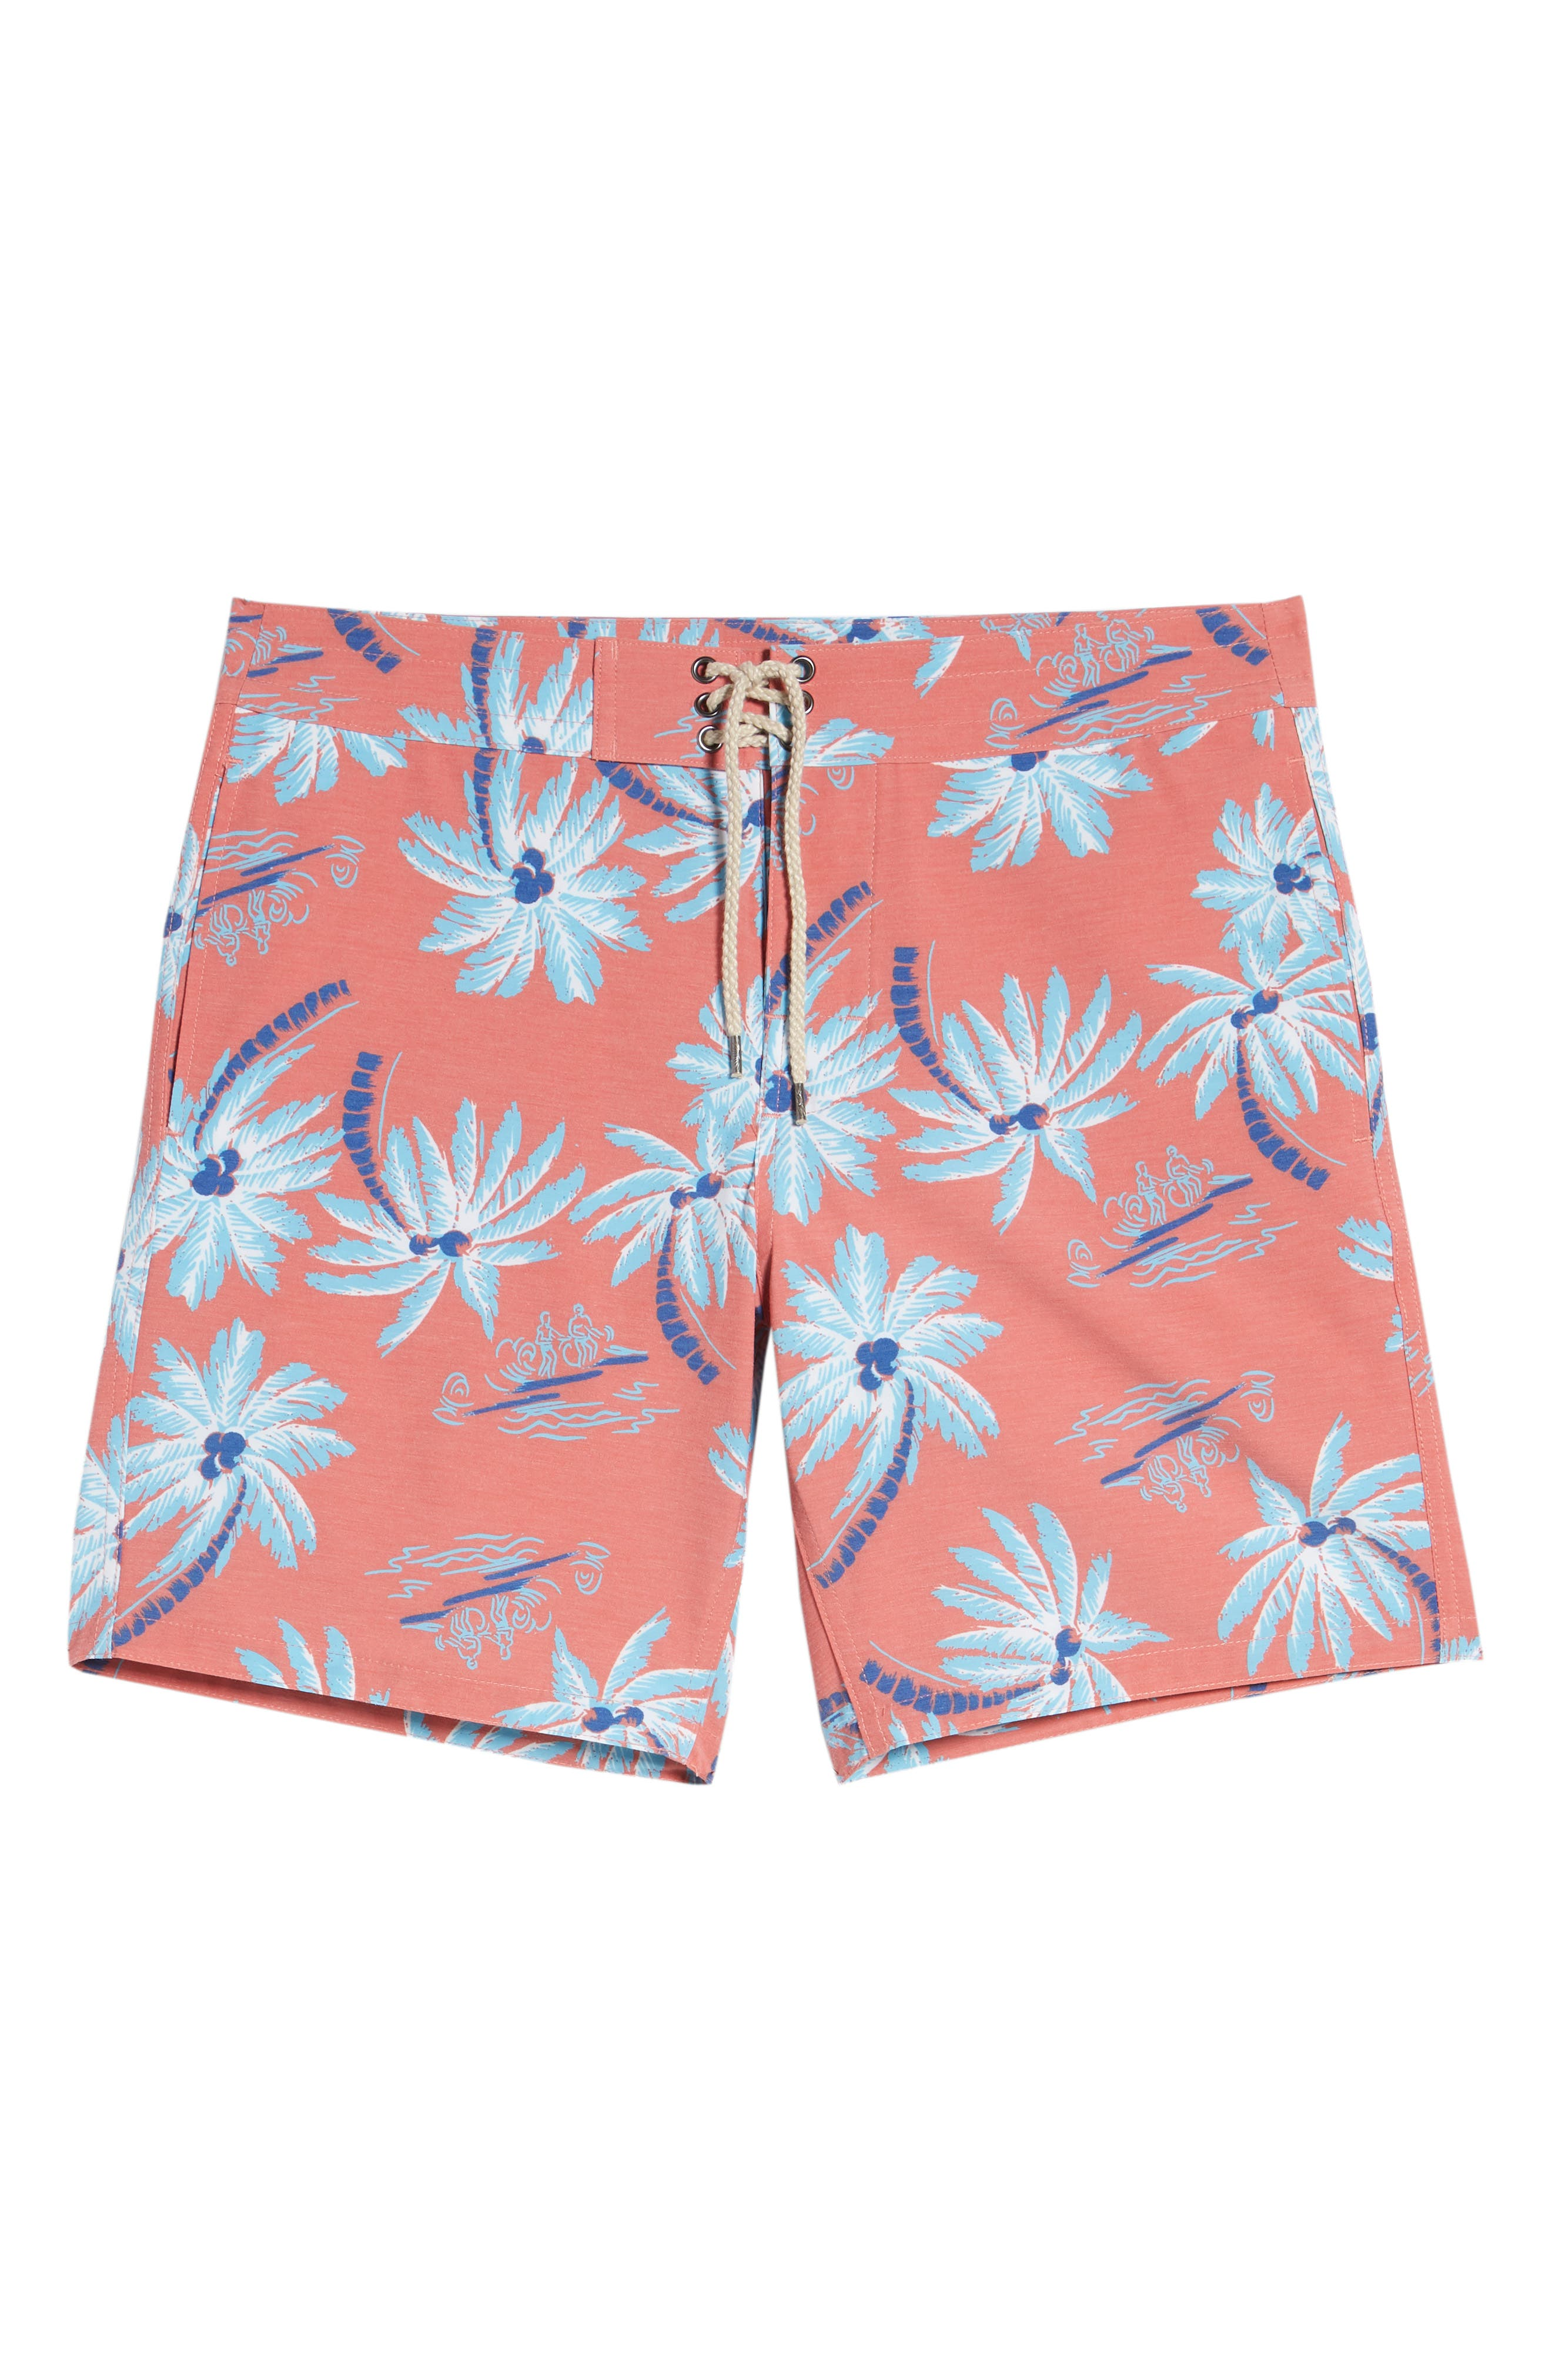 Classic Board Shorts,                             Alternate thumbnail 6, color,                             Red Palm Hawaiian